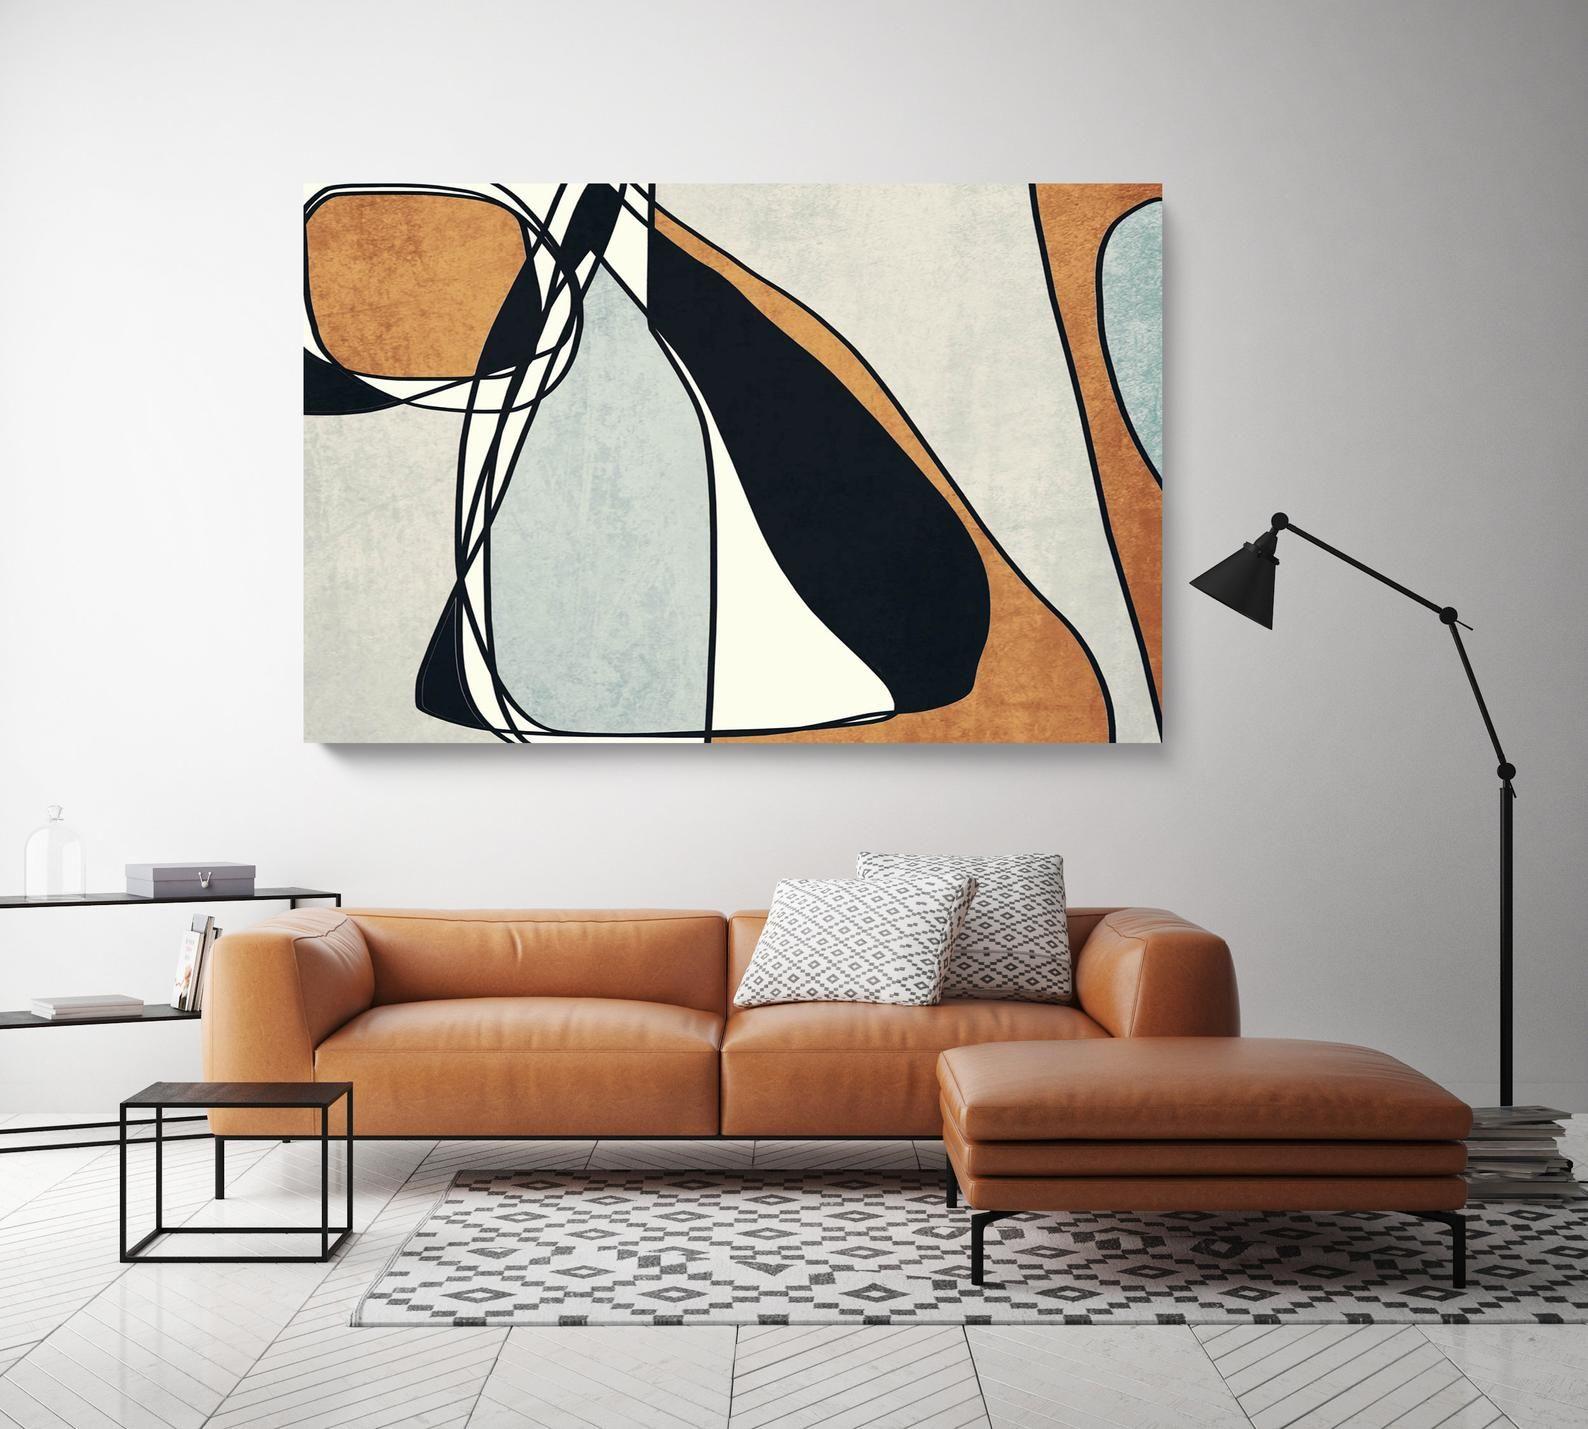 bohemian minimalism Modern art Abstract grey andgreen minimalist painting,Nordic minimalism boho abstract wall art,beige texture paintings